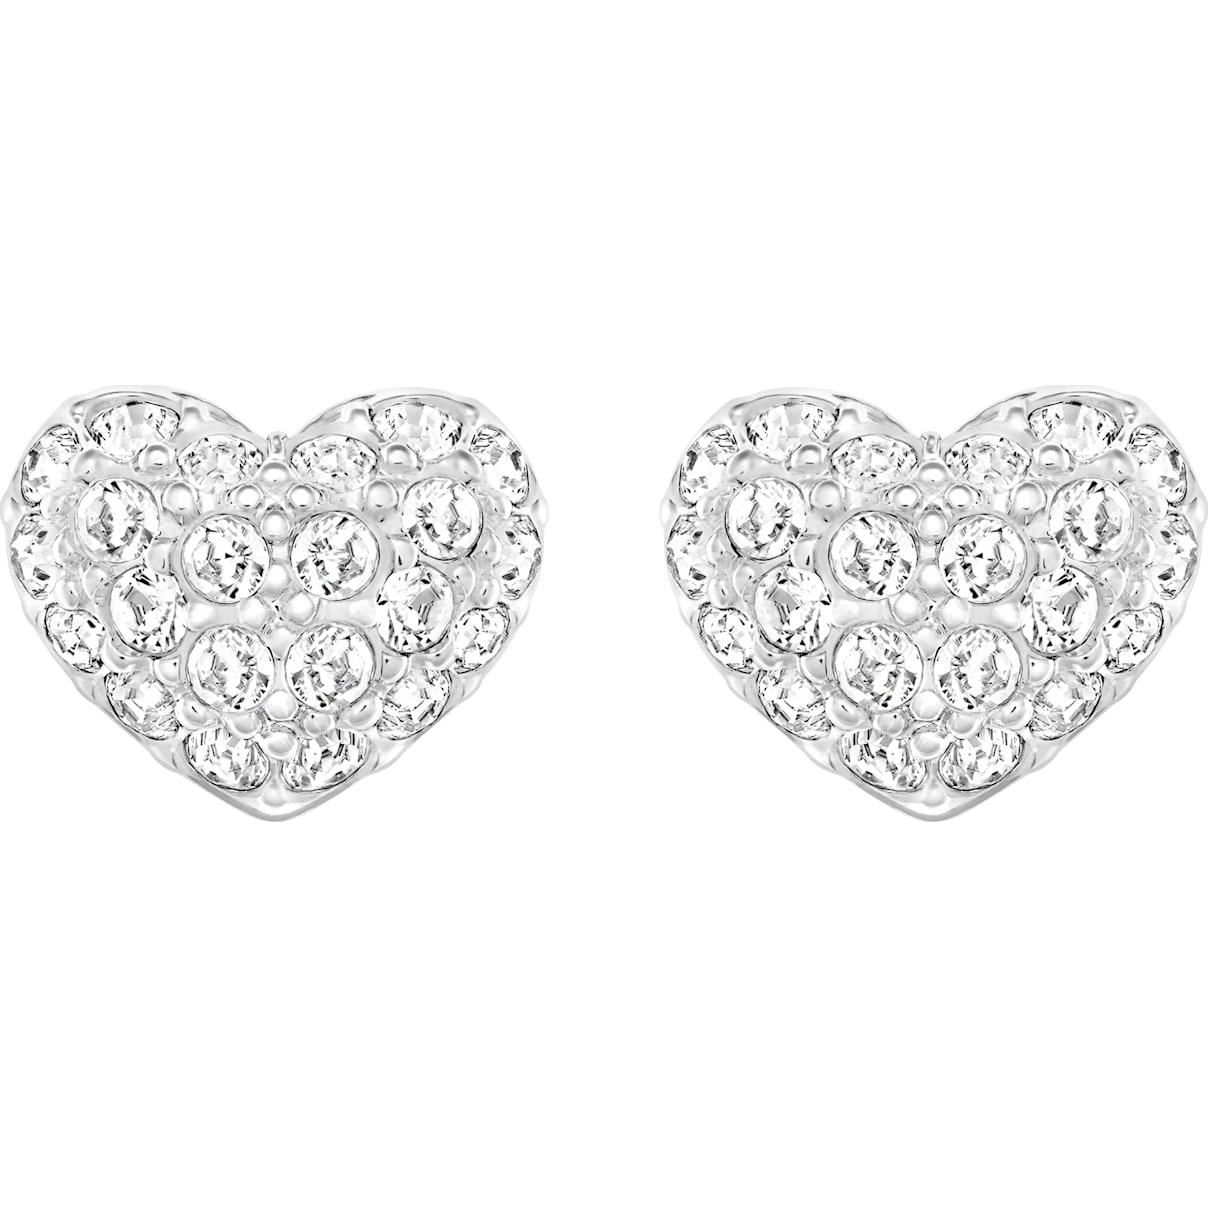 Swarovski Heart Pierced Earrings, White, Rhodium plated